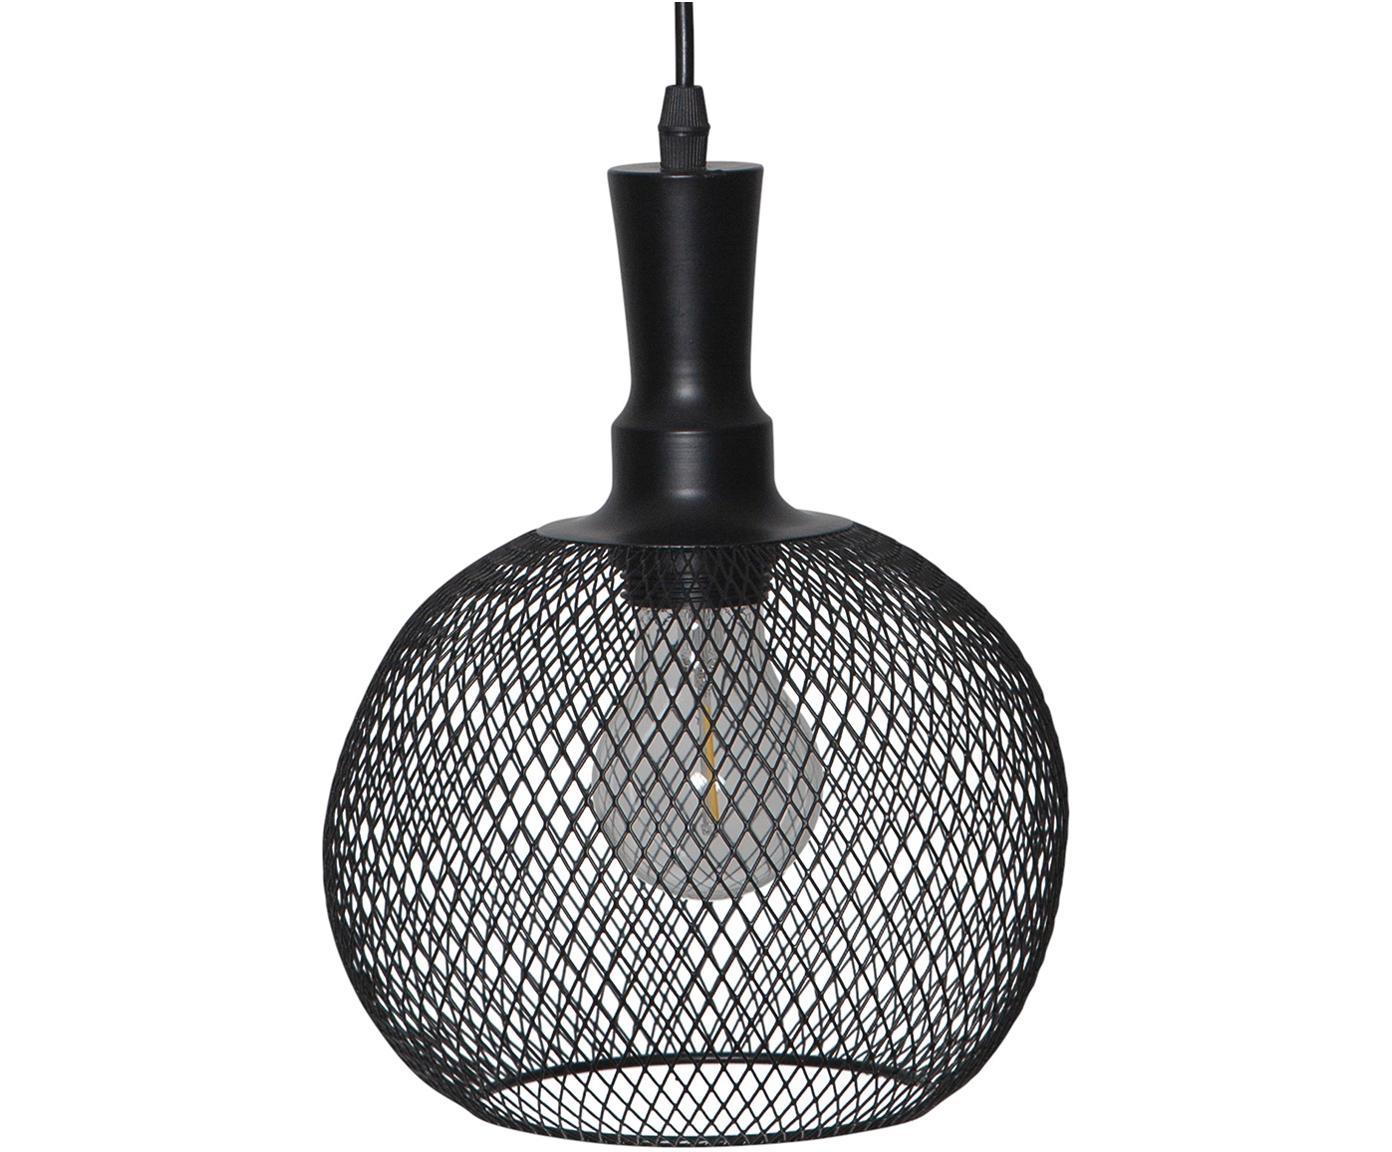 Solar outdoor LED lamp Sunlight, Metall, Kunststoff, Zwart, Ø 19 x H 24 cm